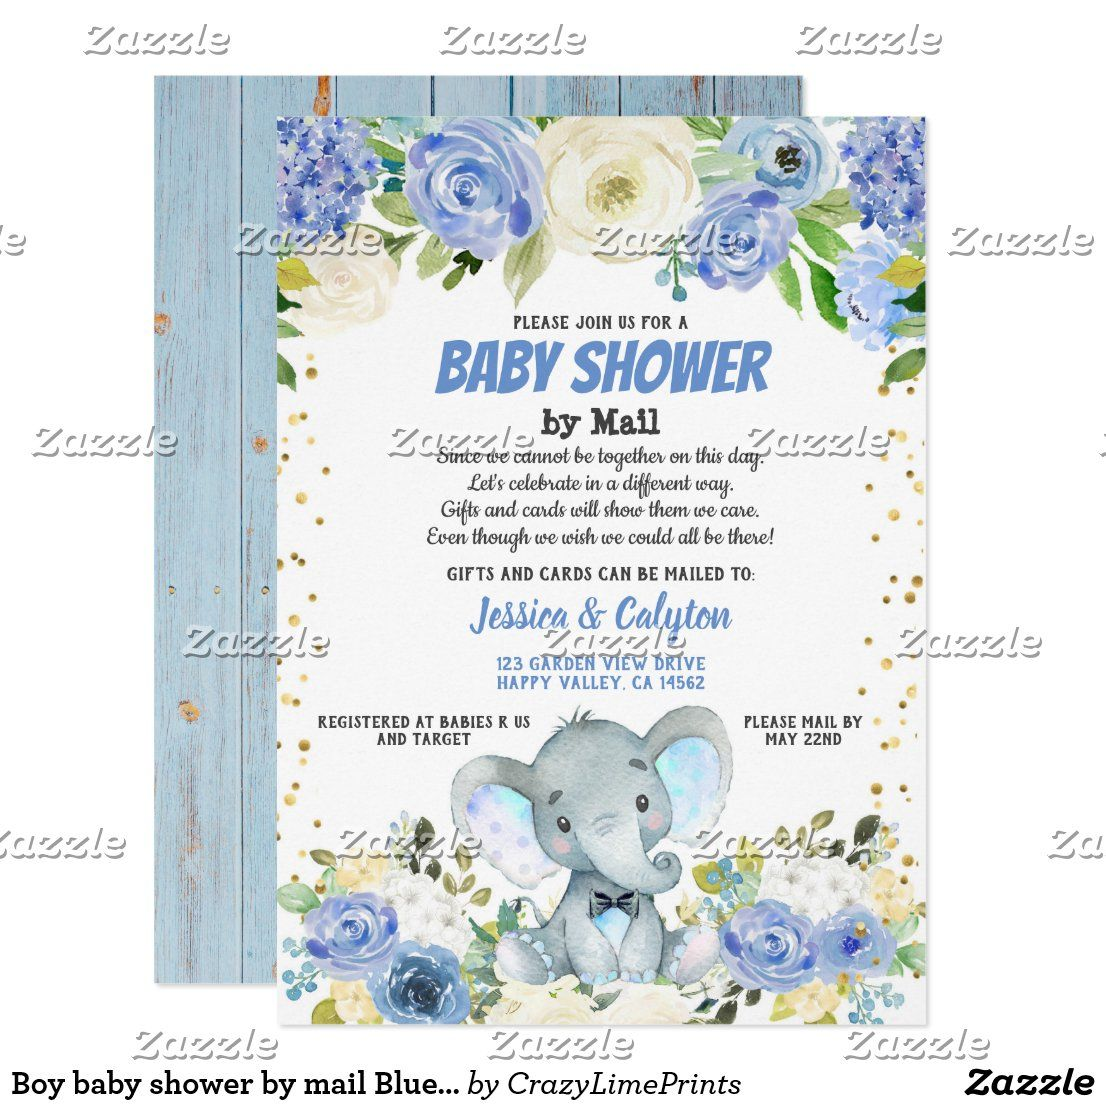 Boy Baby Shower By Mail Blue Elephant Rose Flower Invitation Zazzle Com In 2020 Baby Boy Shower Flower Invitation Virtual Baby Shower